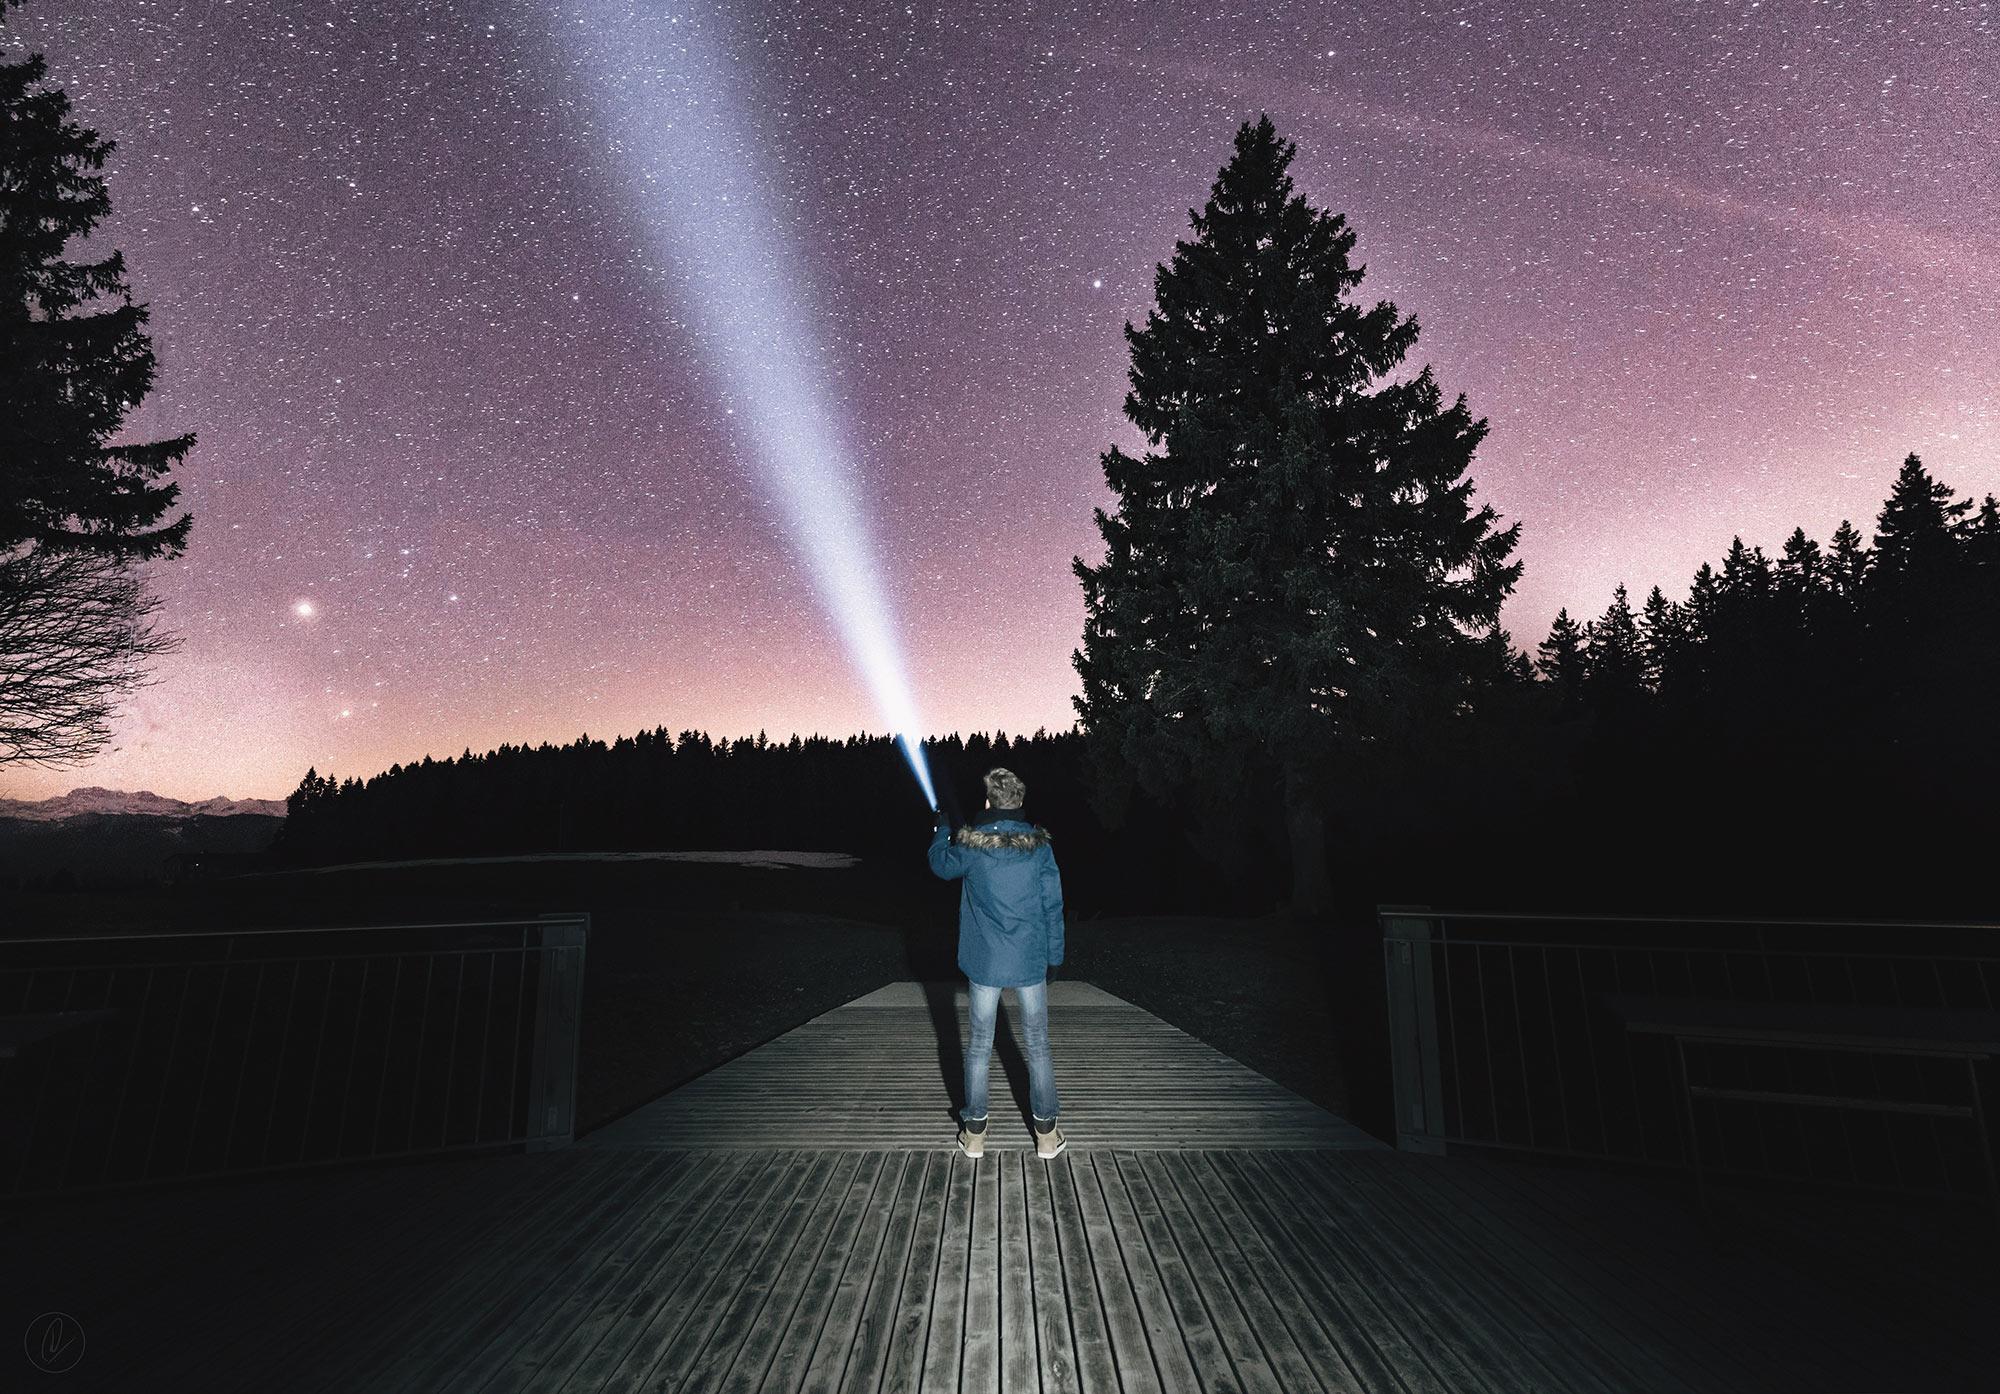 Digiscope in astronomy